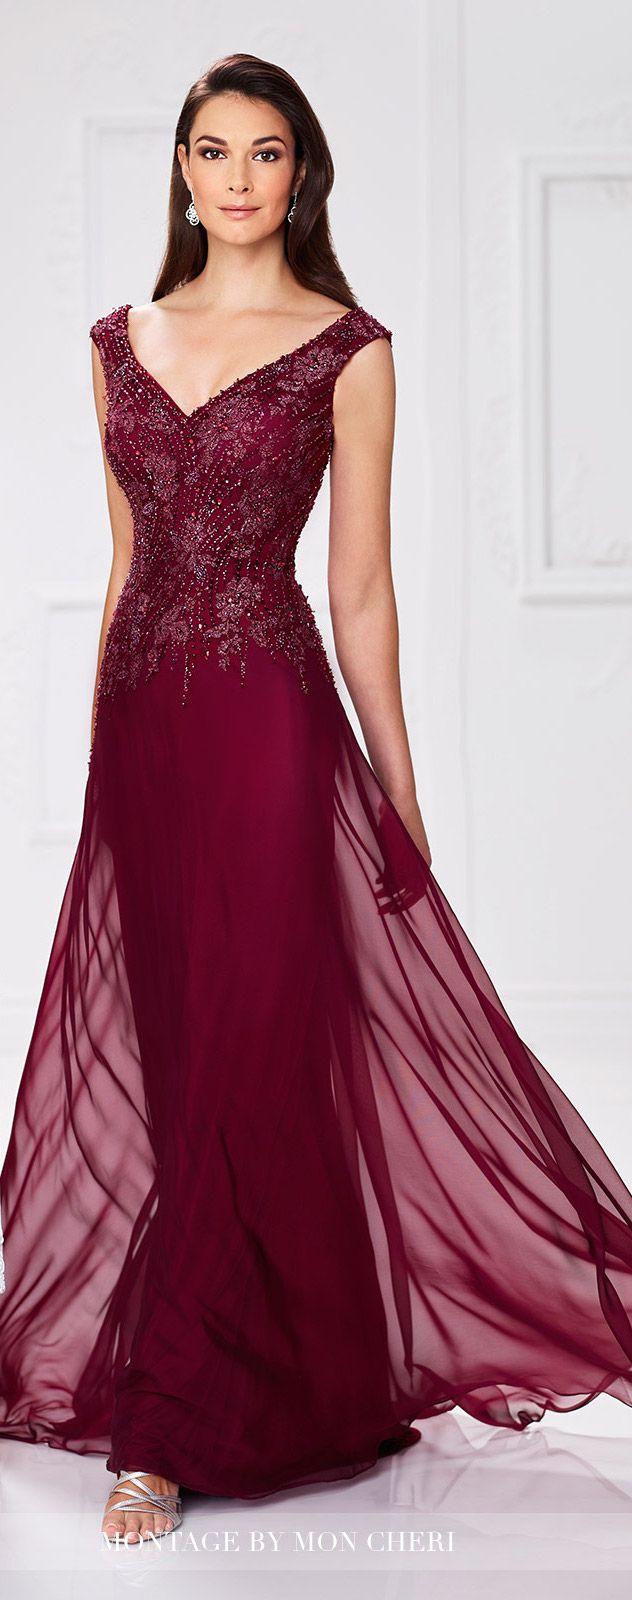 best abiti eleganti images on pinterest ball gown long prom